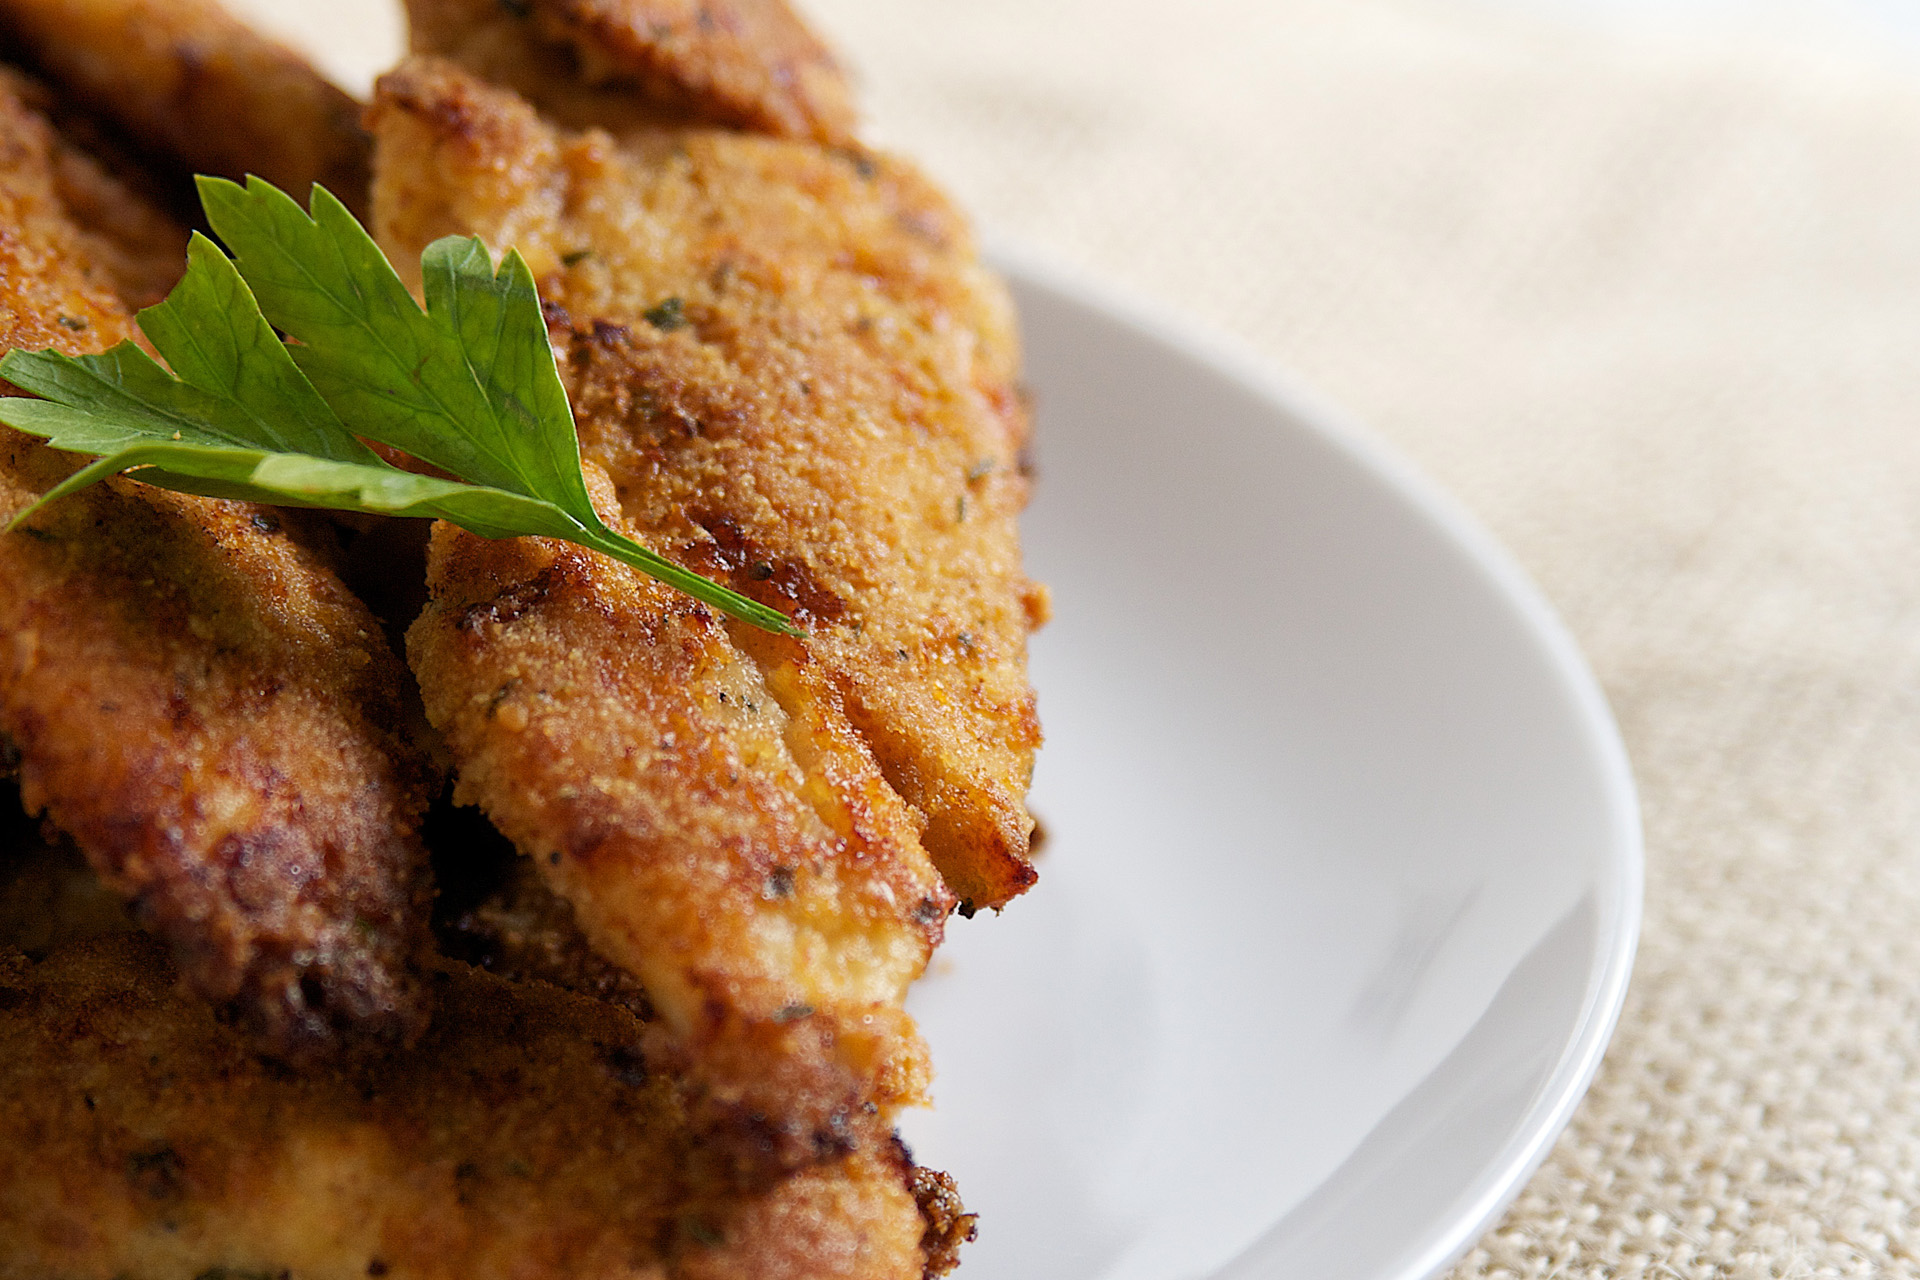 Baked Chicken Tender Side